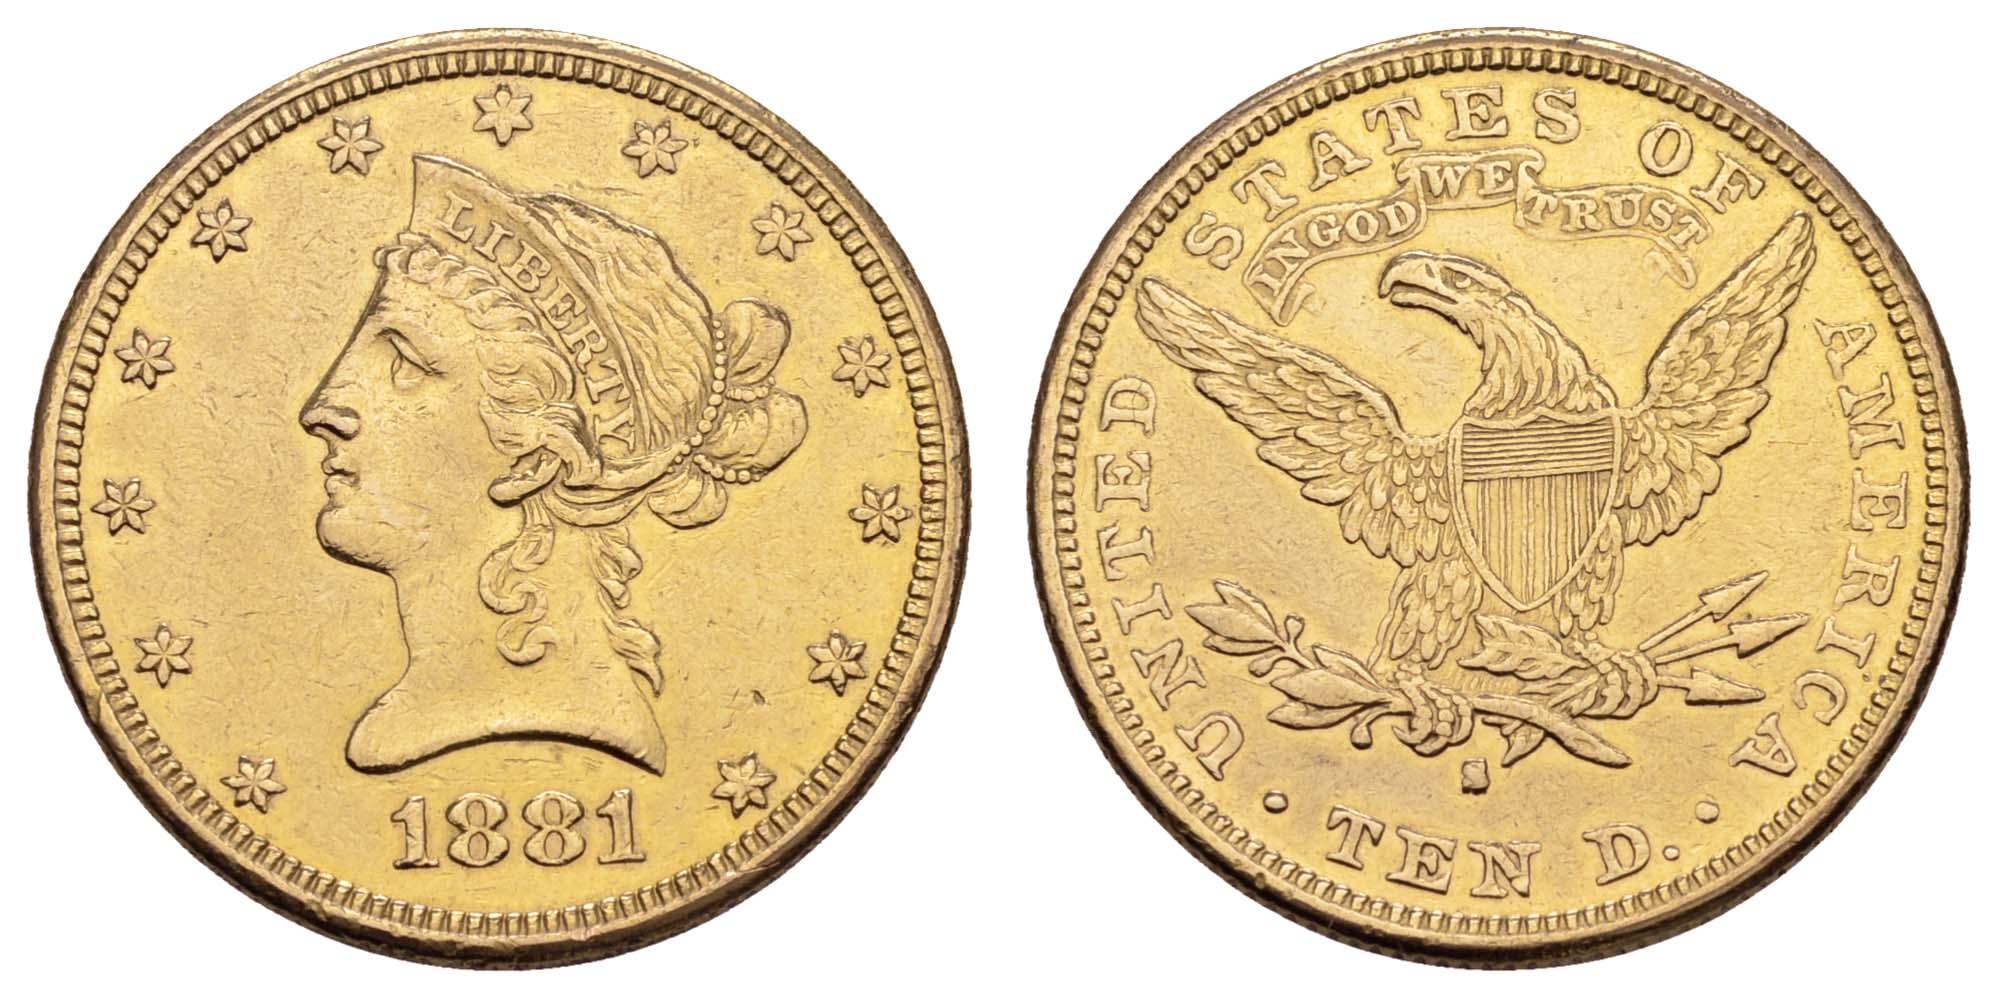 Lot 2148 - übersee usa -  Auktionshaus Ulrich Felzmann GmbH & Co. KG Coins single lots